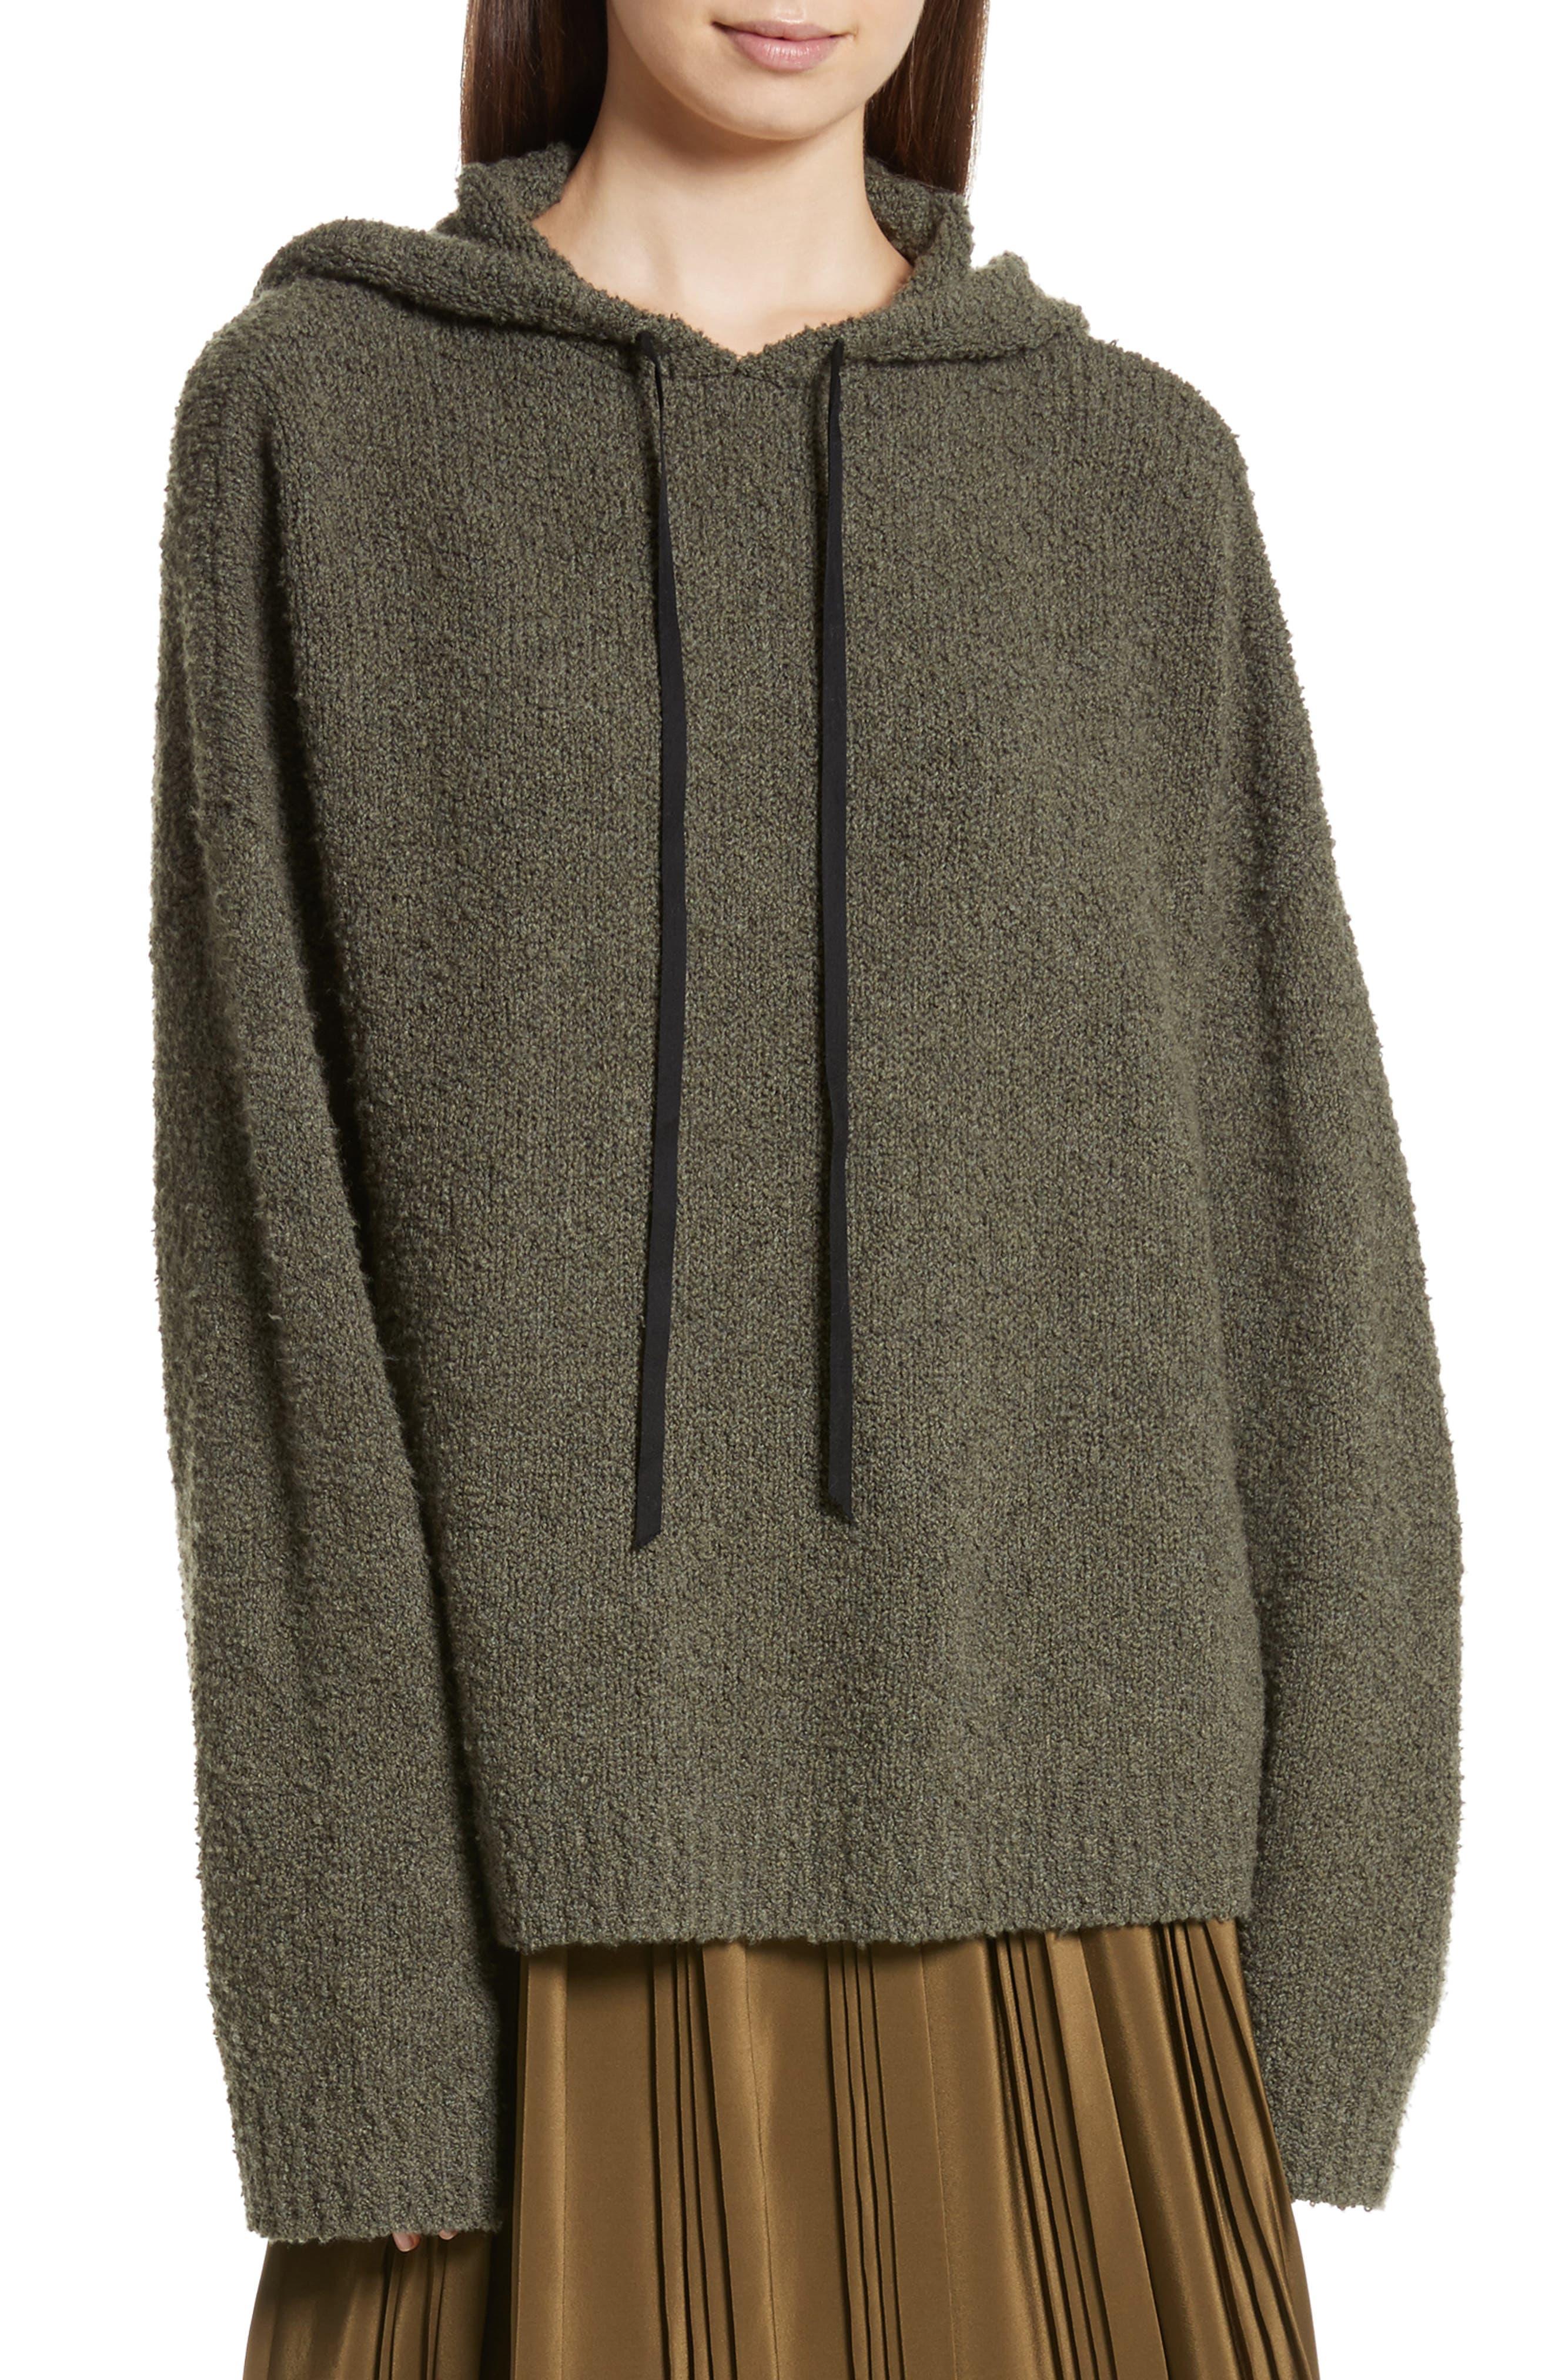 Alternate Image 1 Selected - Robert Rodriguez Merino Wool & Cashmere Reversible Hooded Sweater